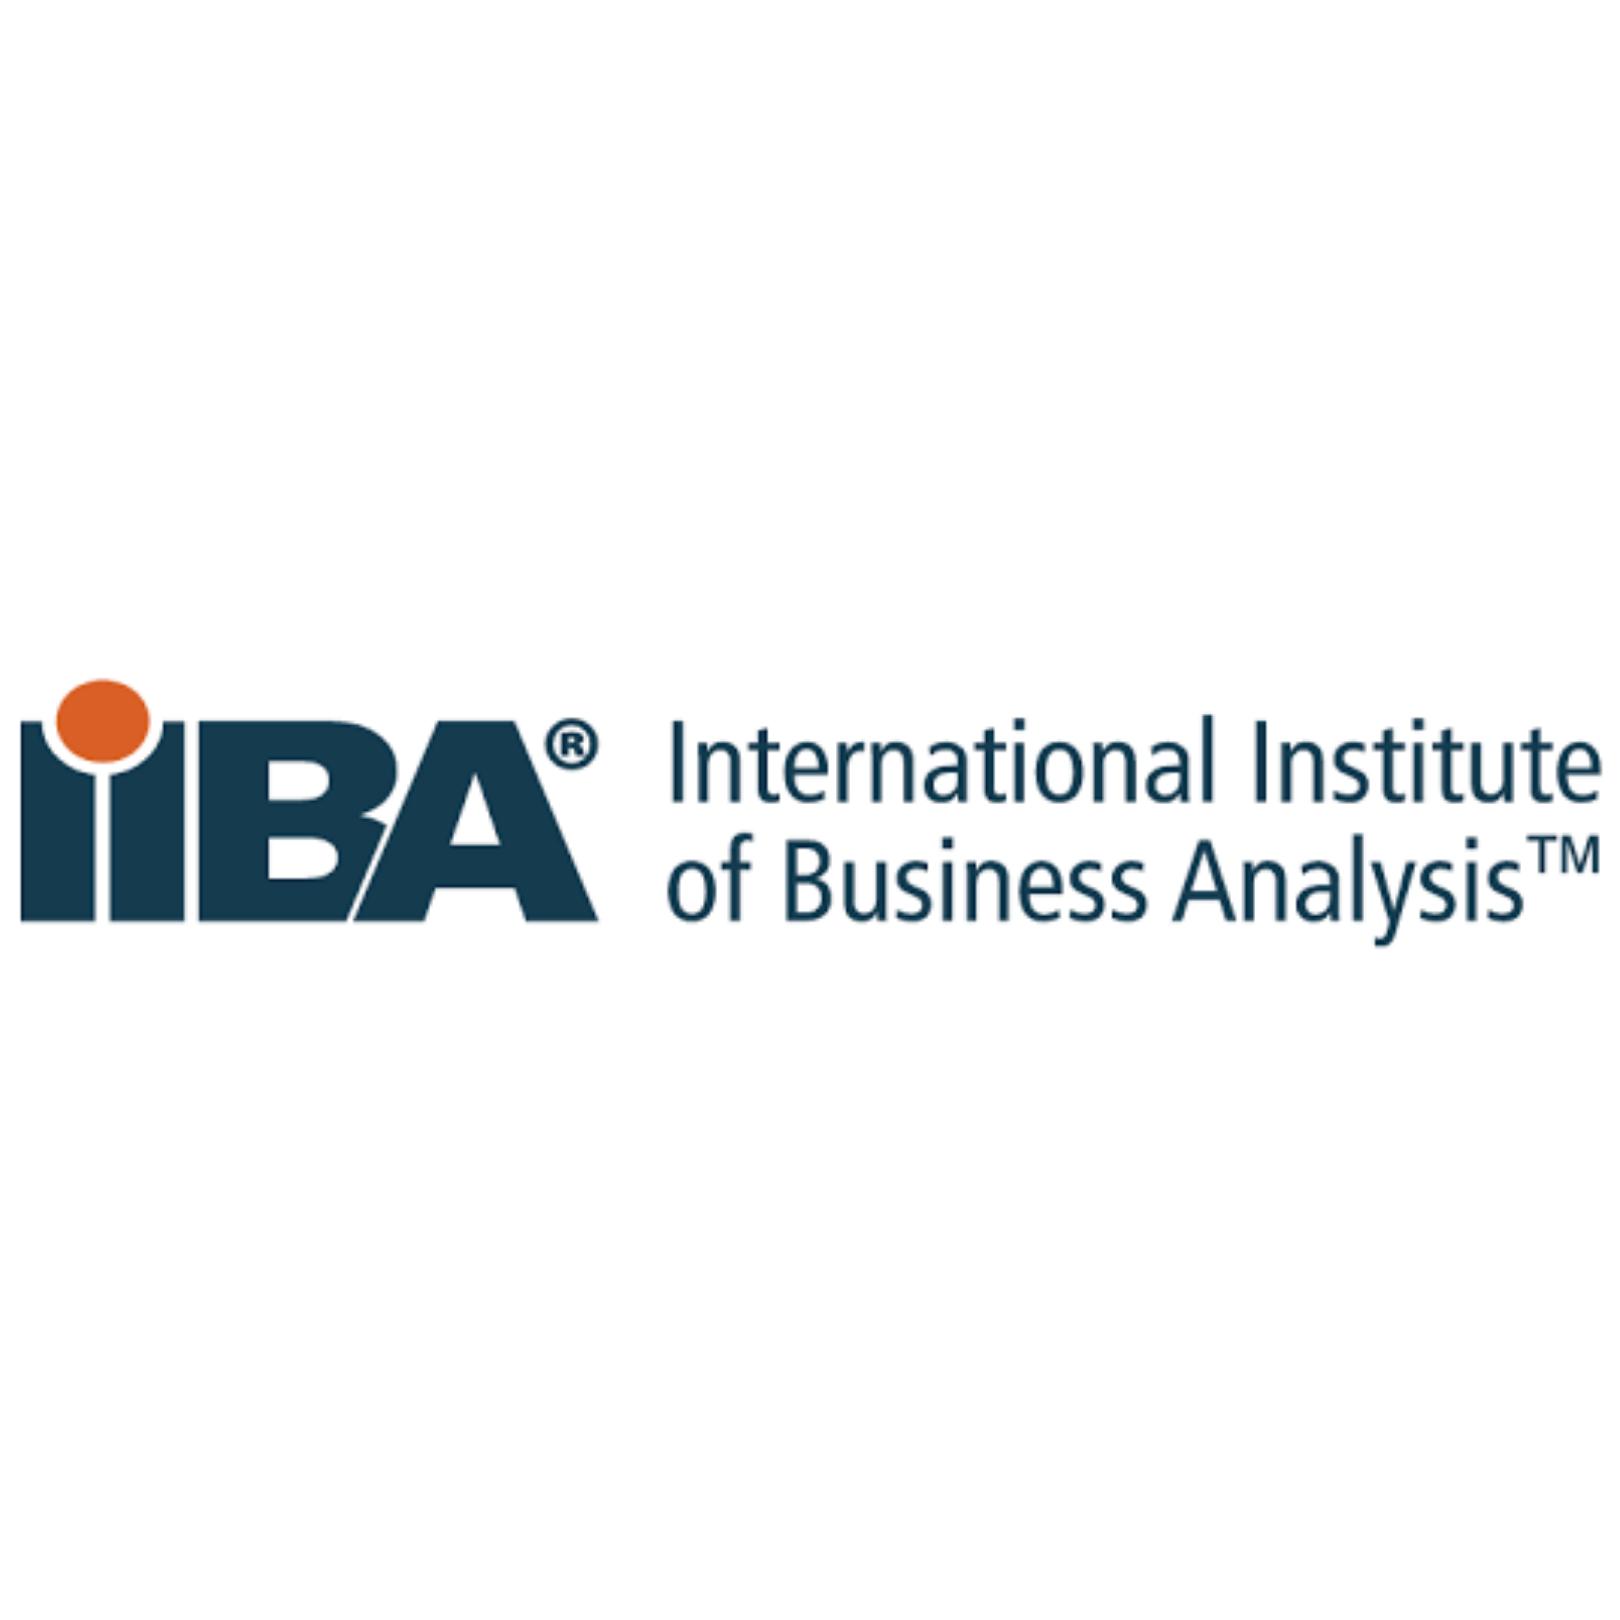 IIBA (International Institute of Business Analysis), The Change Leadership Sponsor & Partner